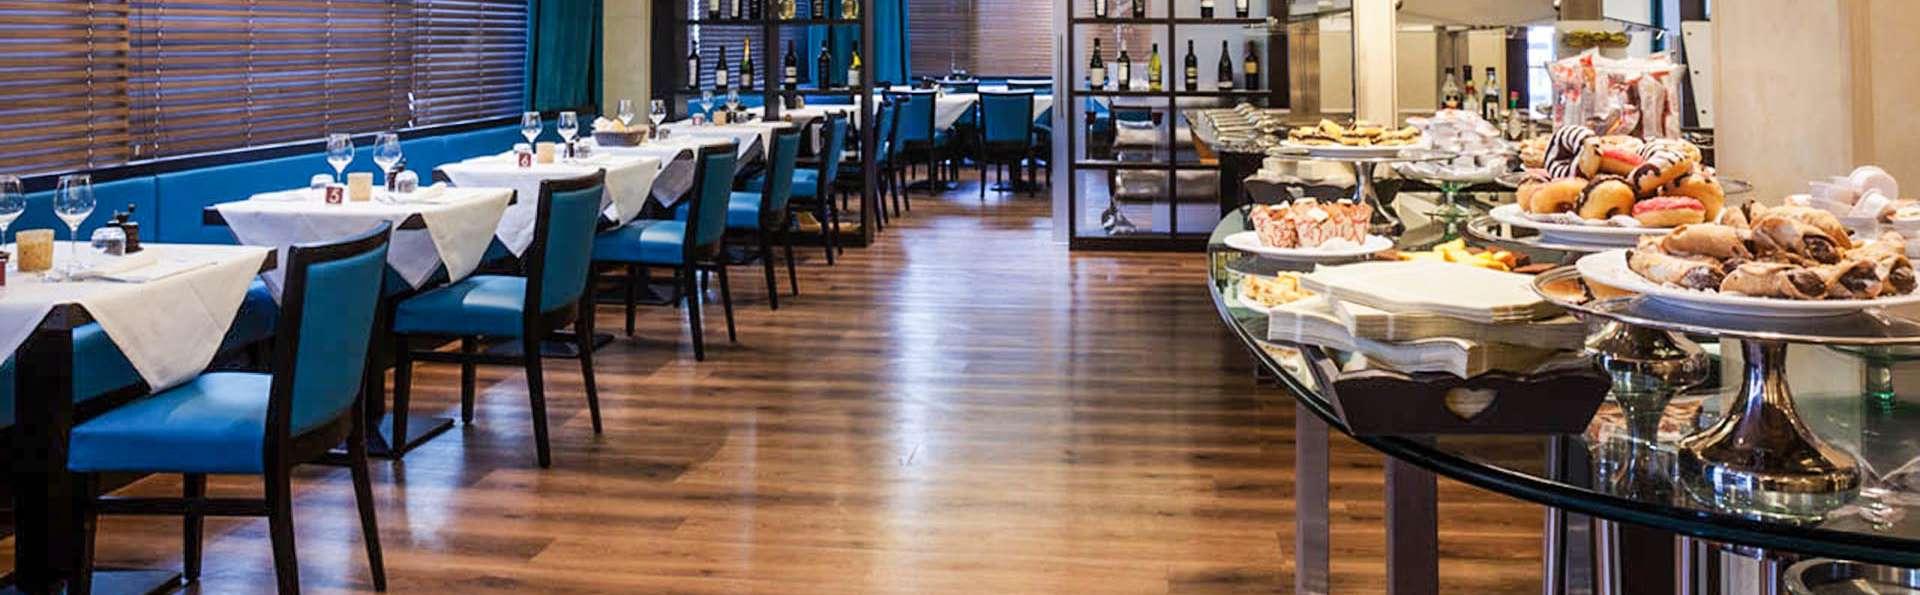 Hotel Apogia Sirio Venezia Mestre - EDIT_RESTAURANT_03.jpg